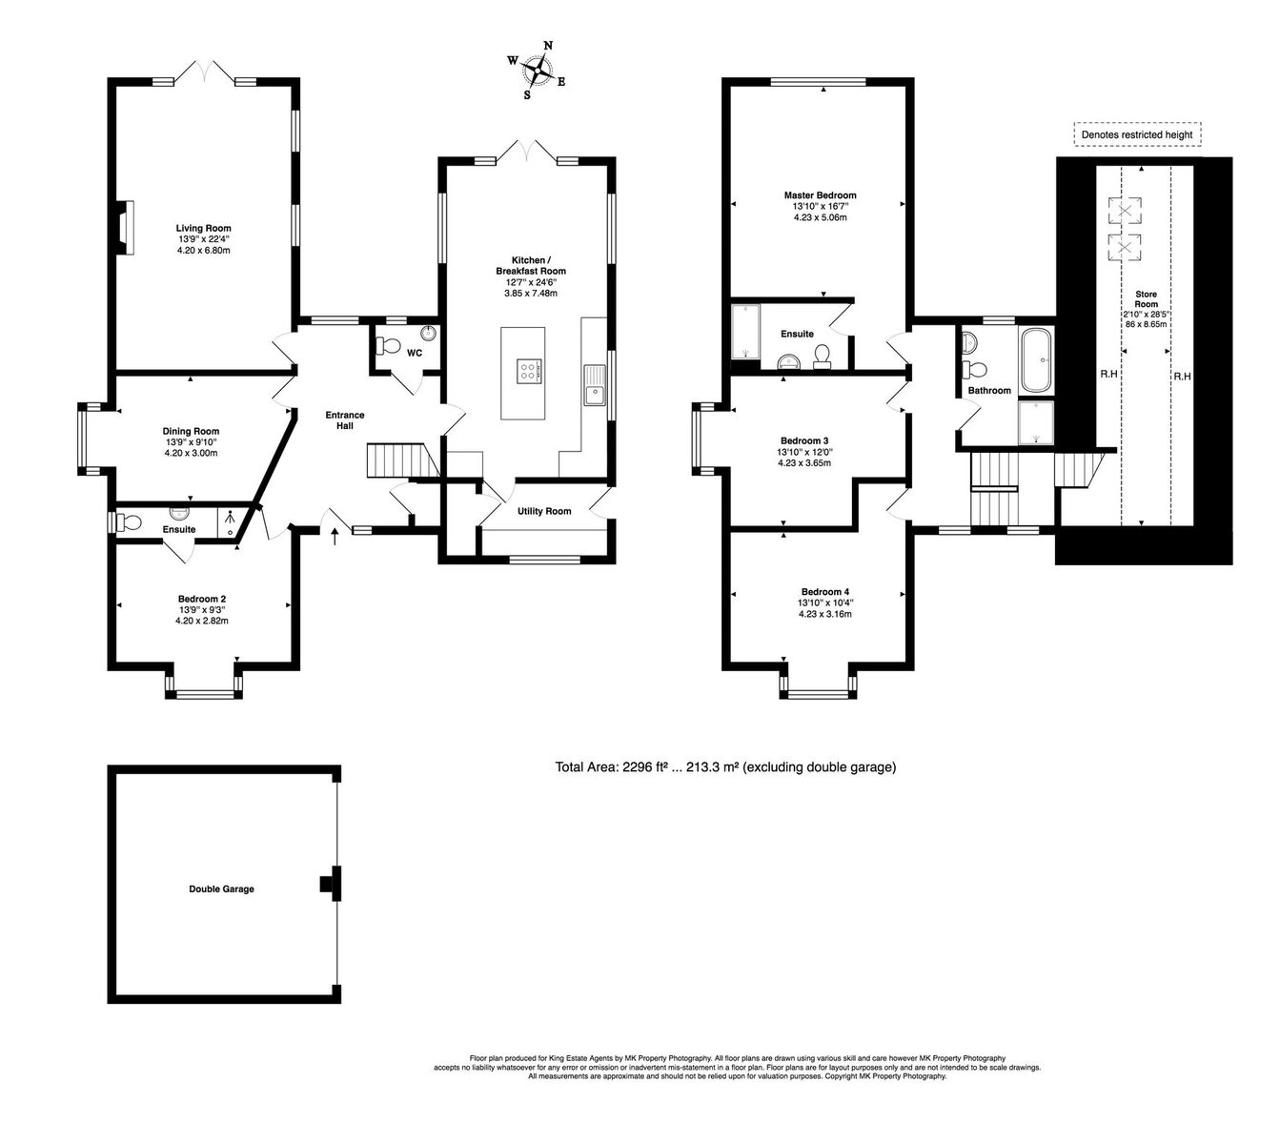 Floorplan for Crow Lane, Lower End, Wavendon, Milton Keynes, Buckinghamshire, MK17 8AR